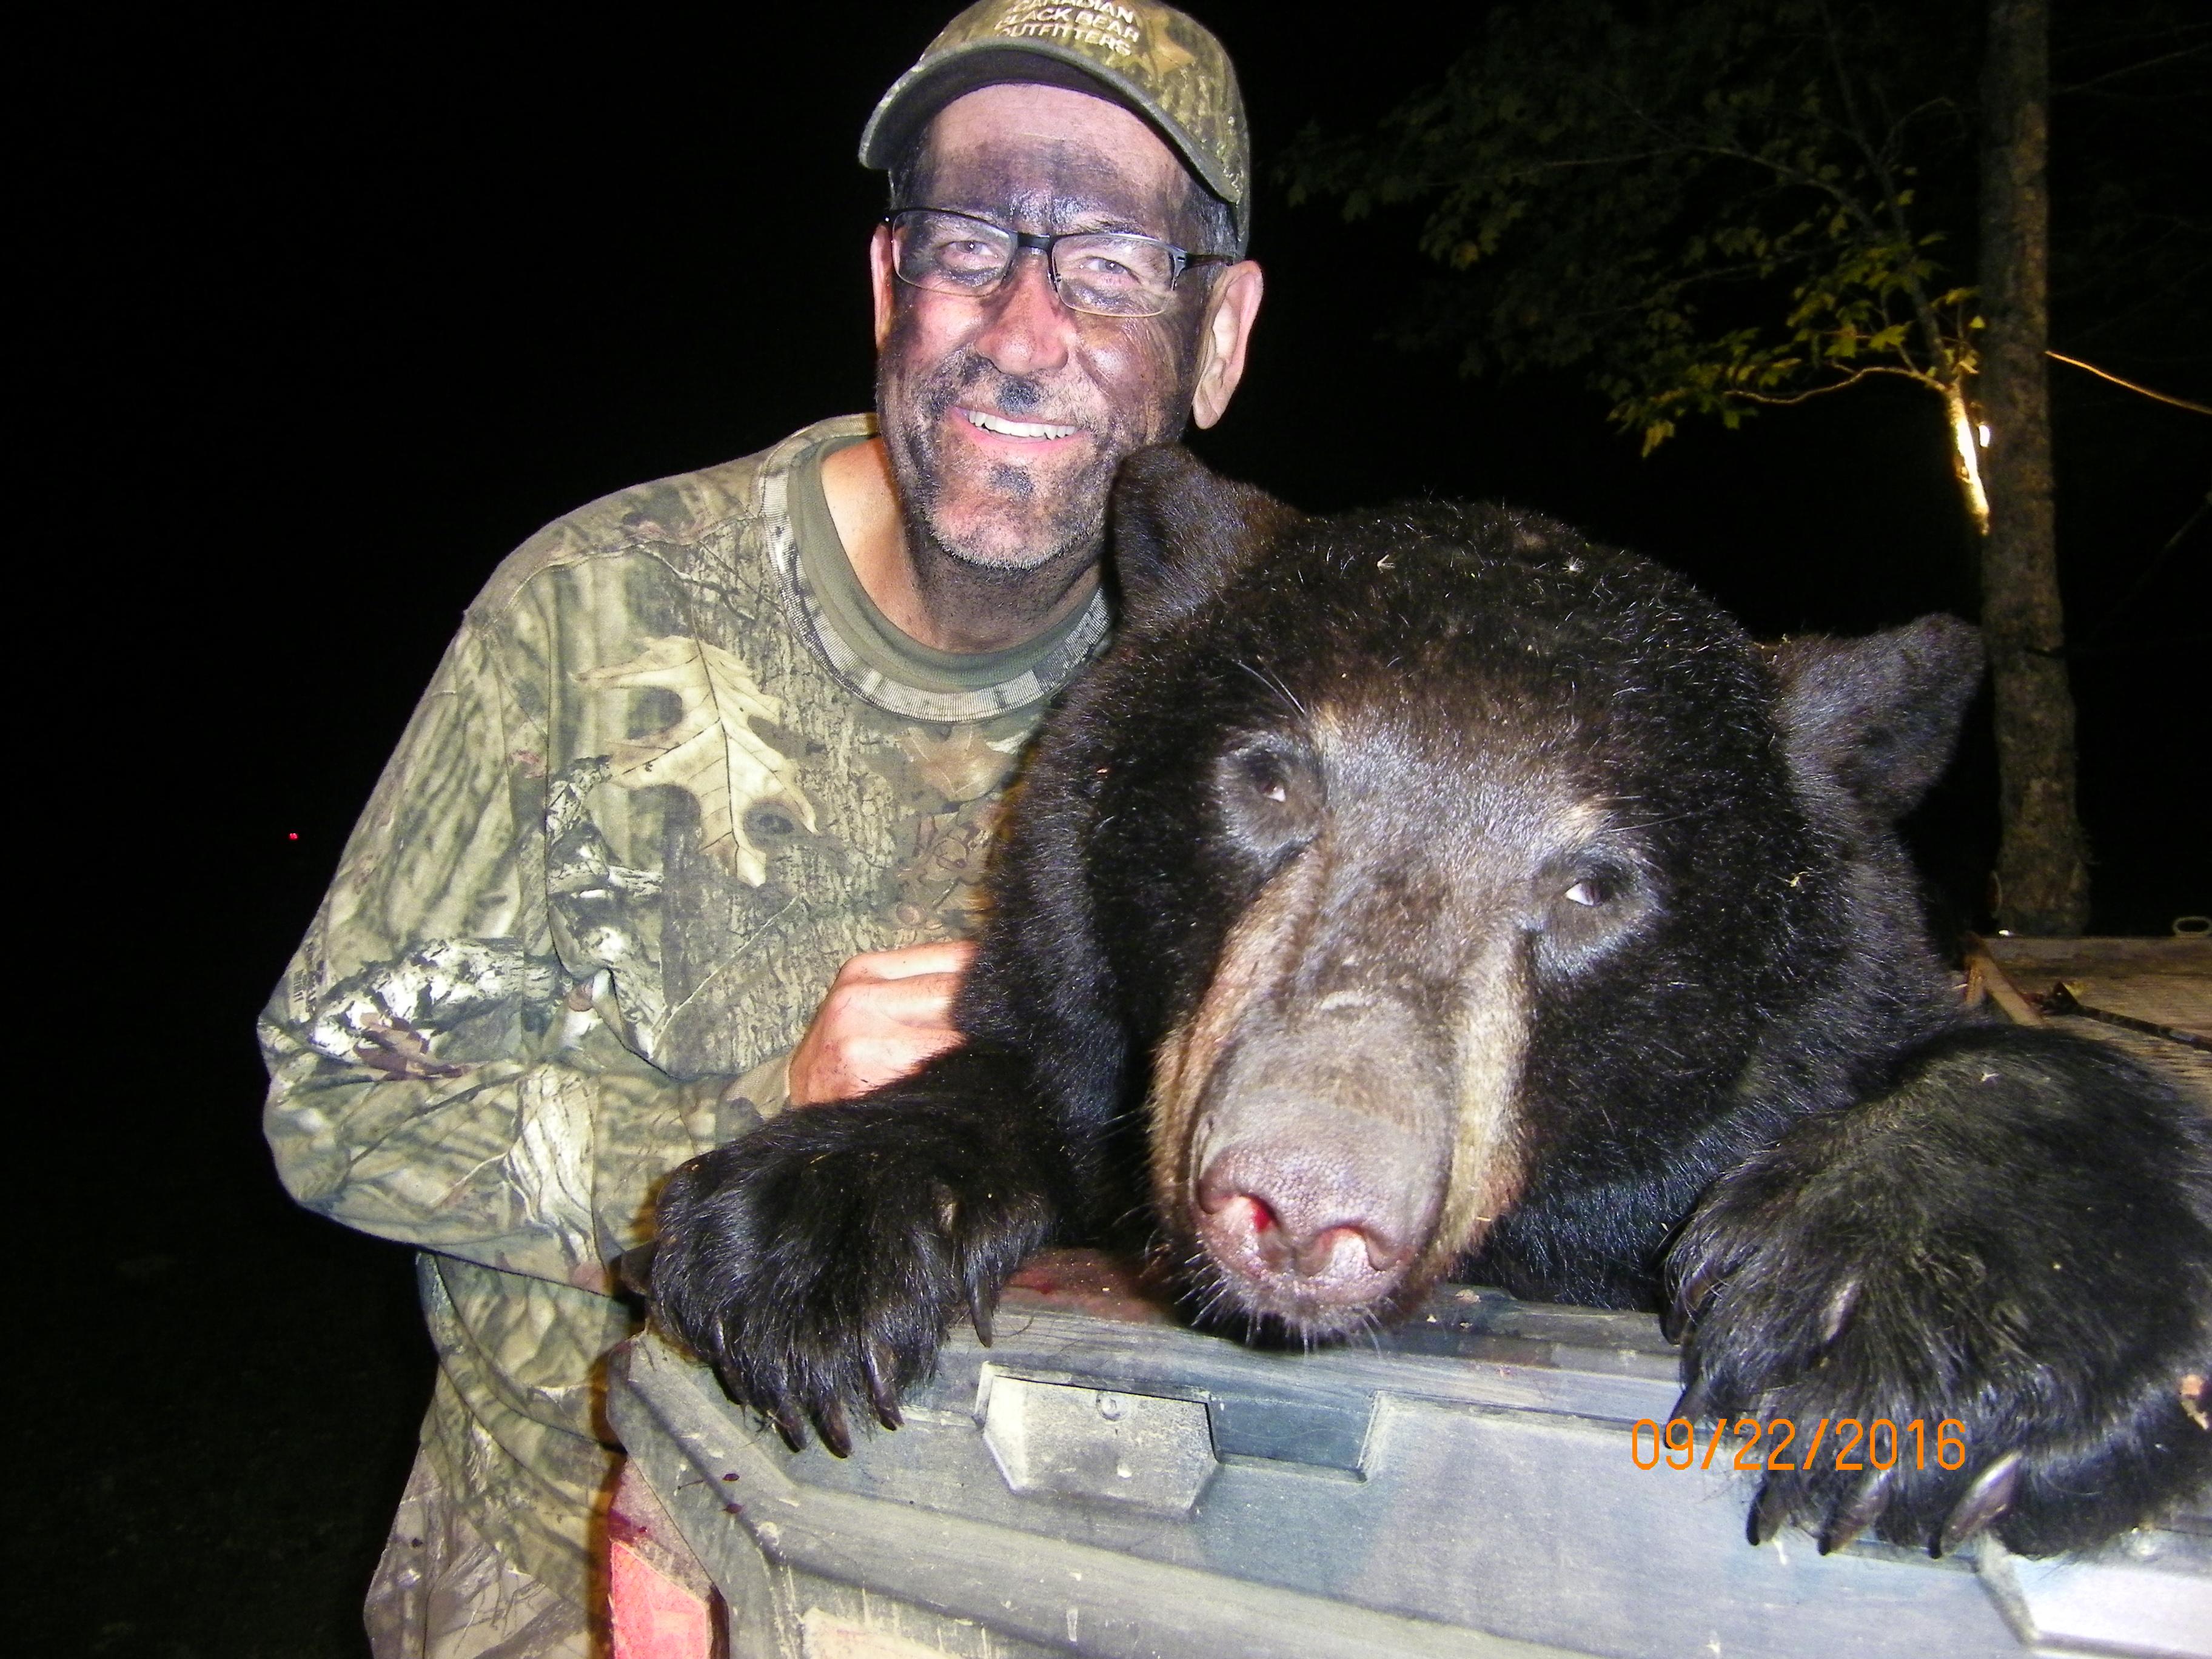 Ken with bear 2016